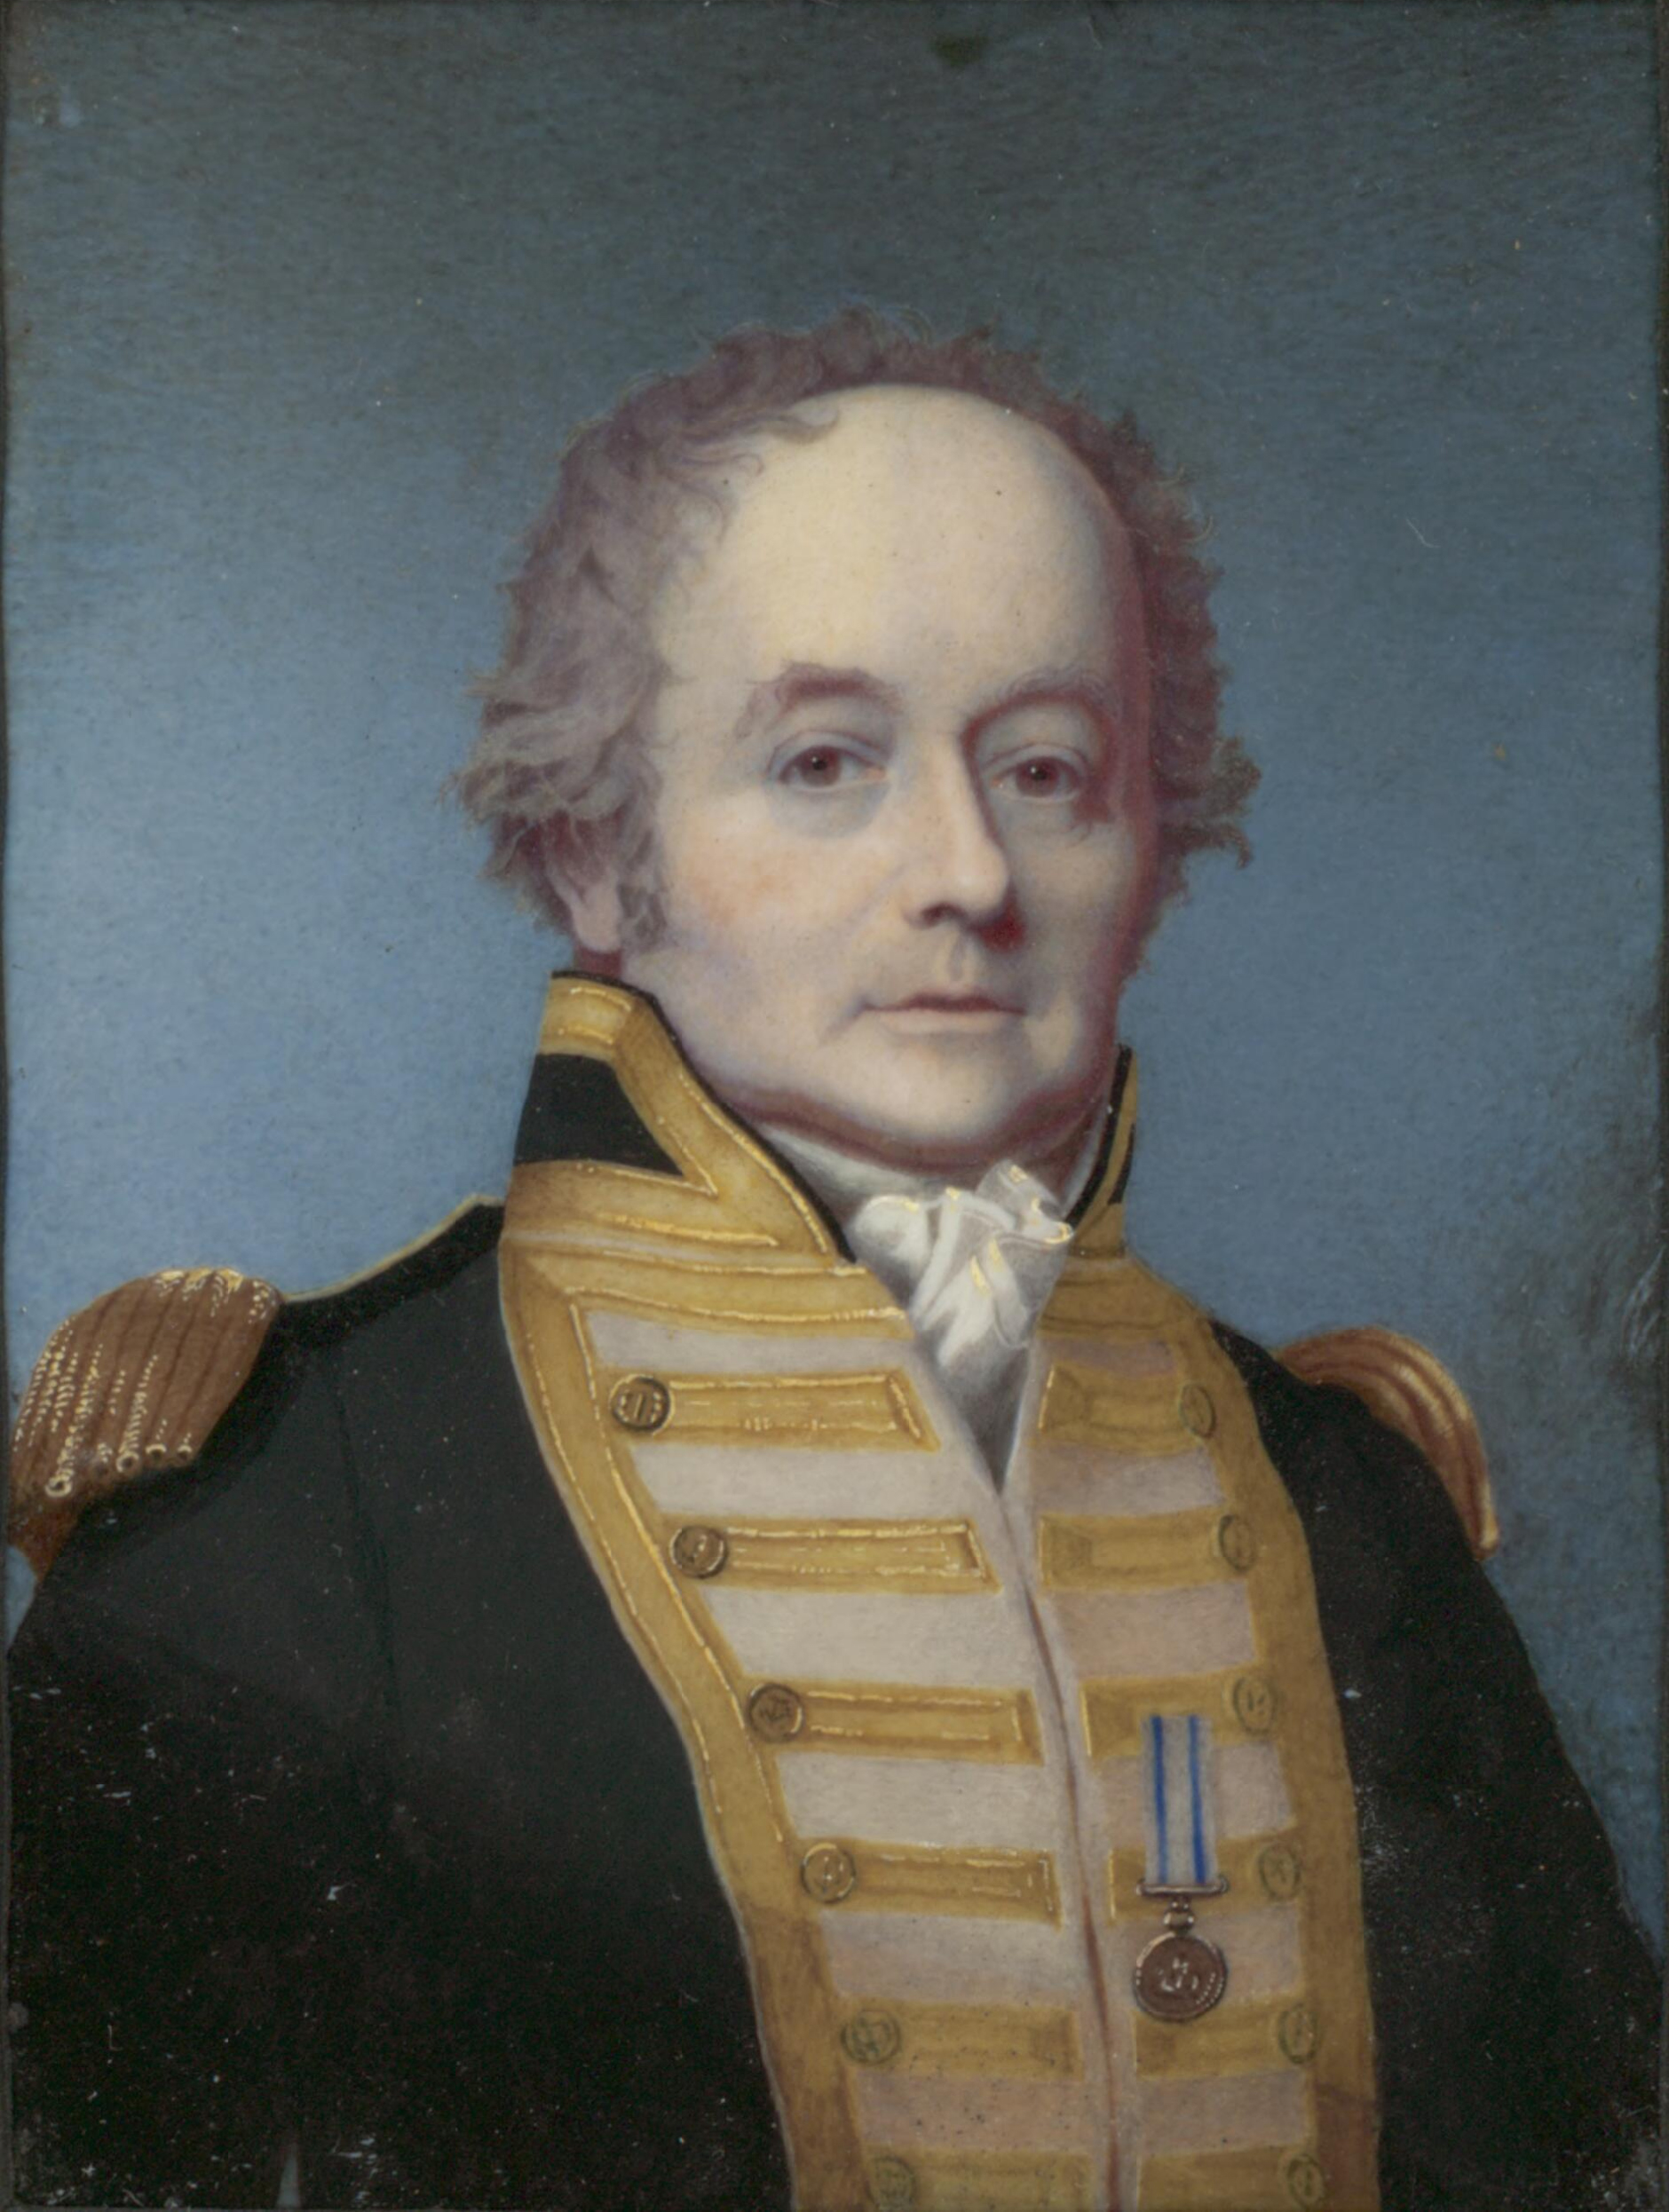 https://i2.wp.com/upload.wikimedia.org/wikipedia/commons/4/48/WilliamBligh.jpeg